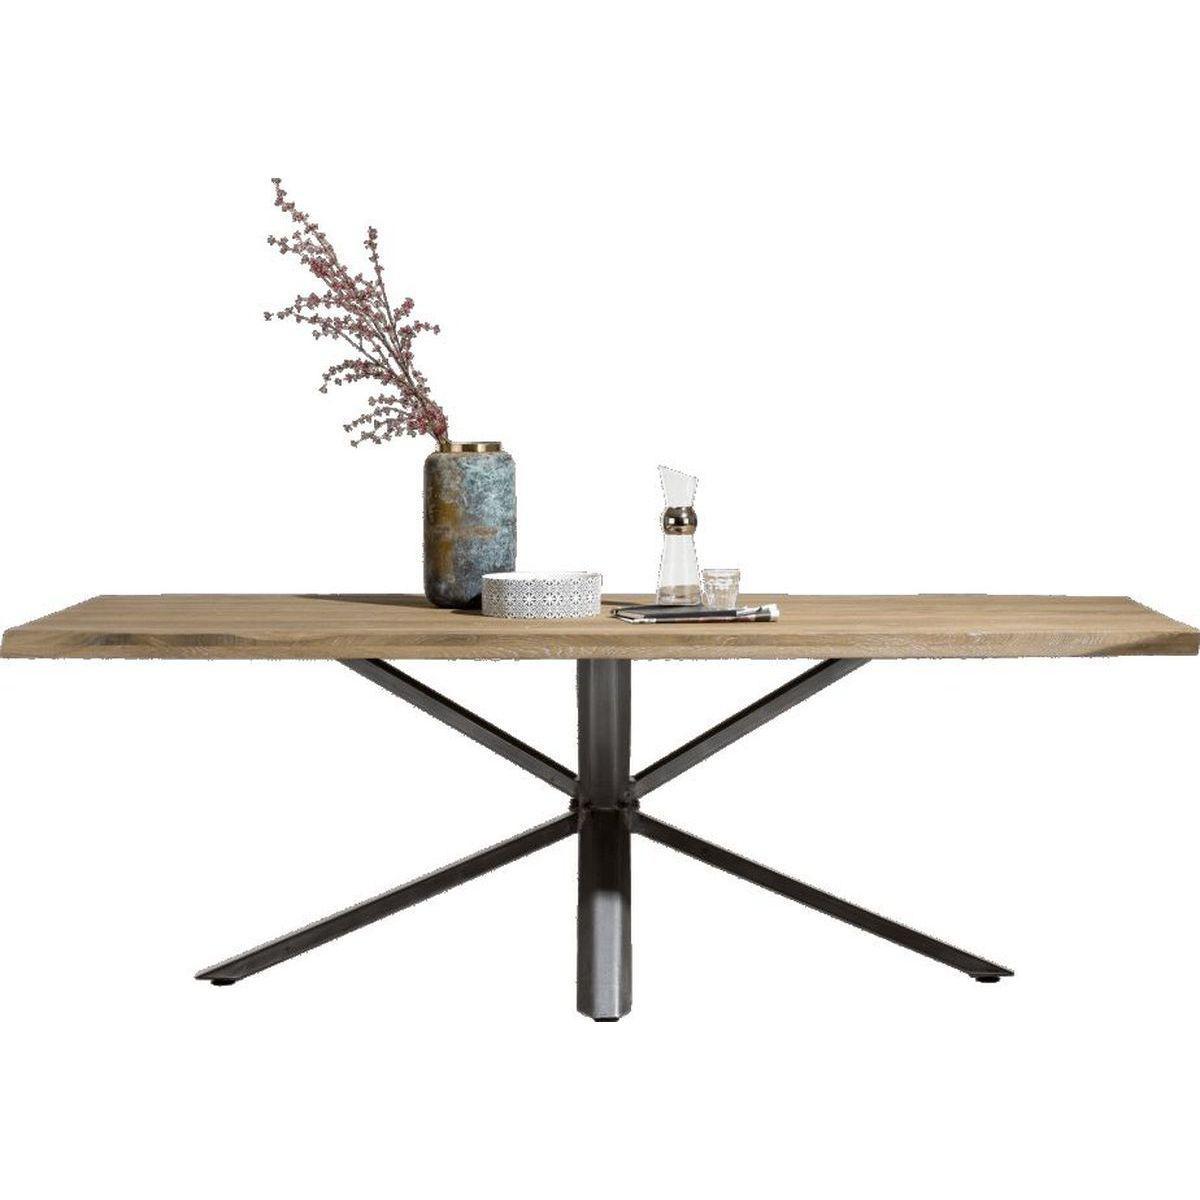 Table VITORIA Henders & Hazel 230cm